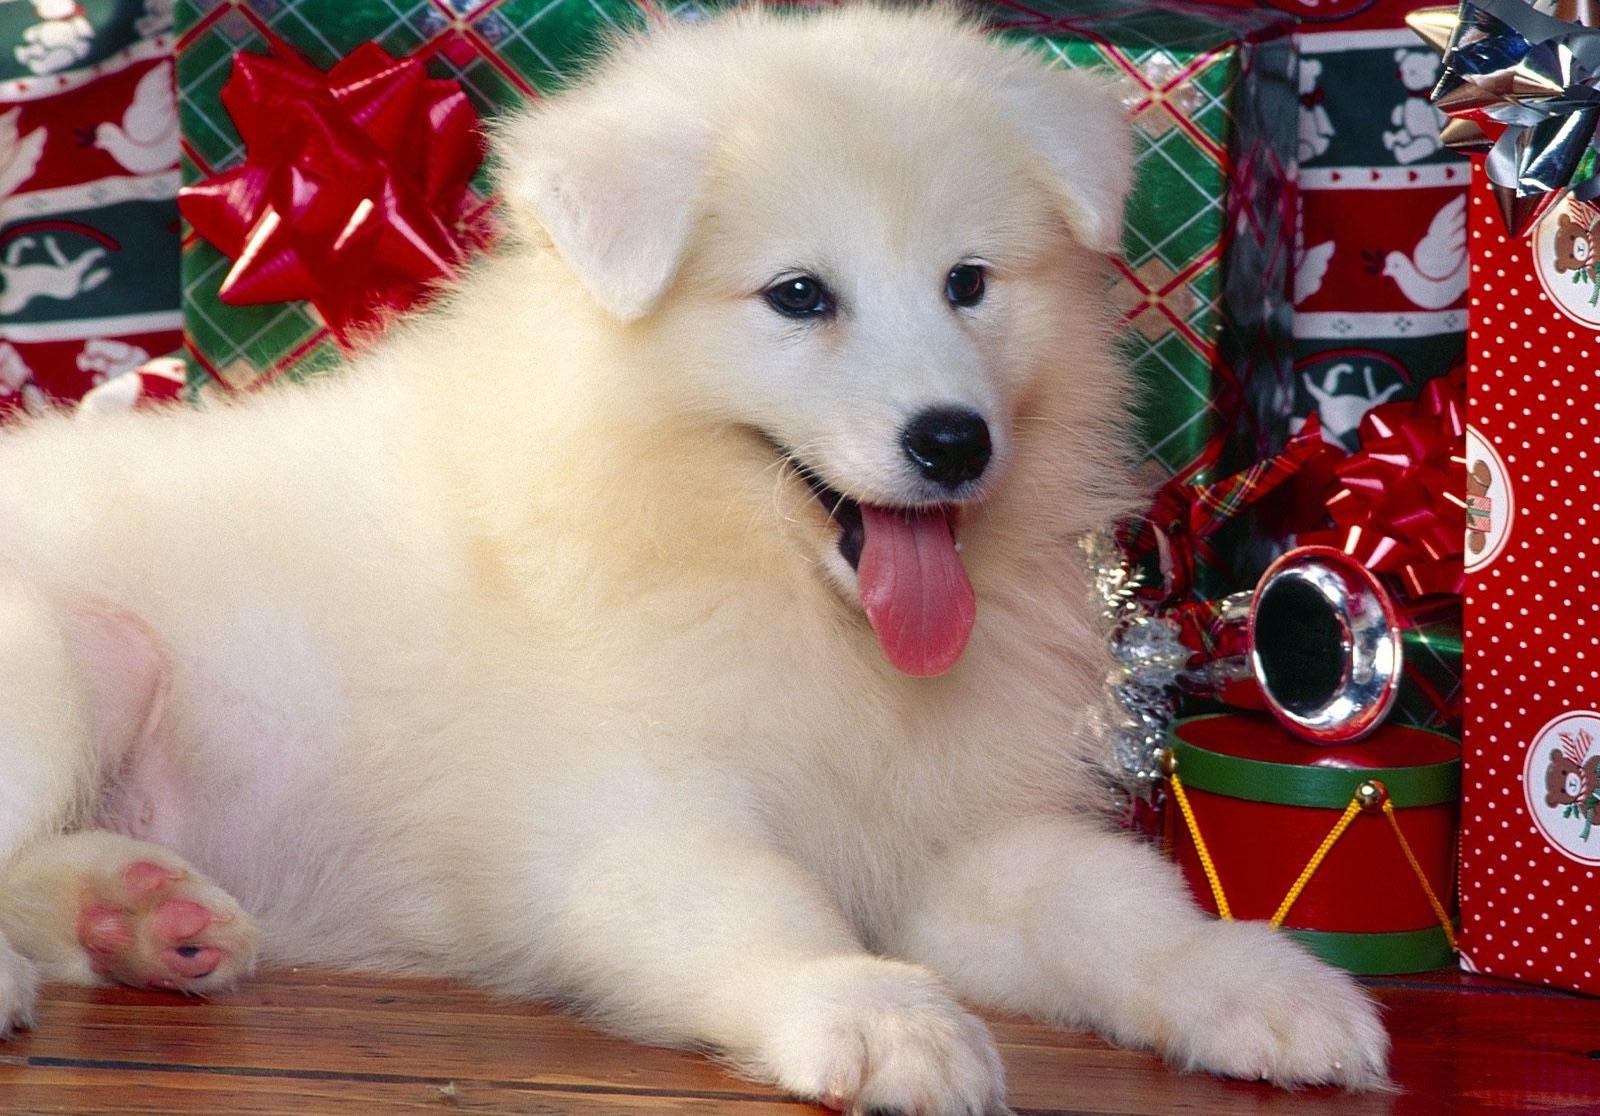 Sfondi 1600x1116 px immagini animali cuccioli for Animali desktop